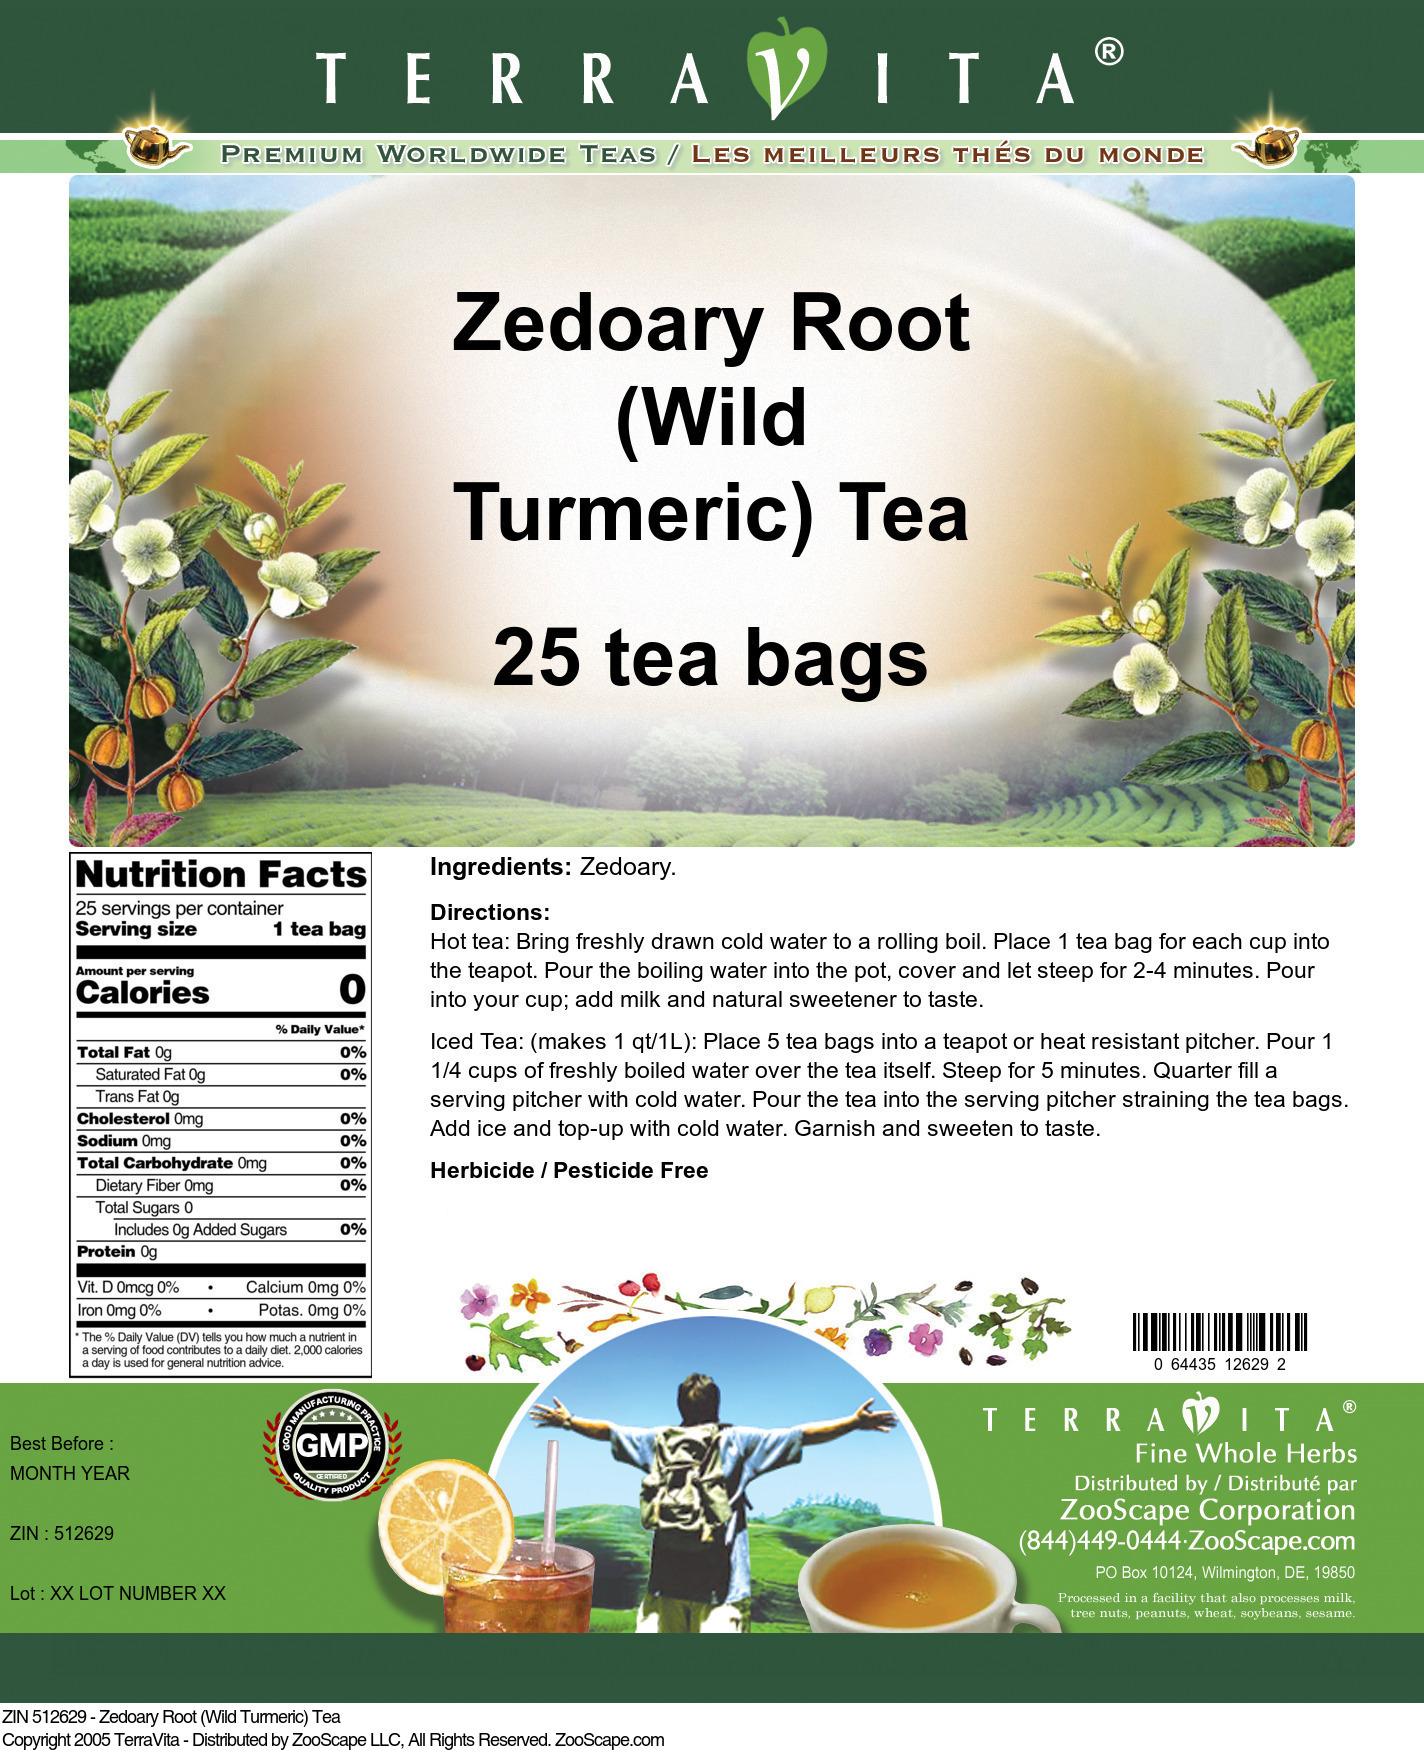 Zedoary Root